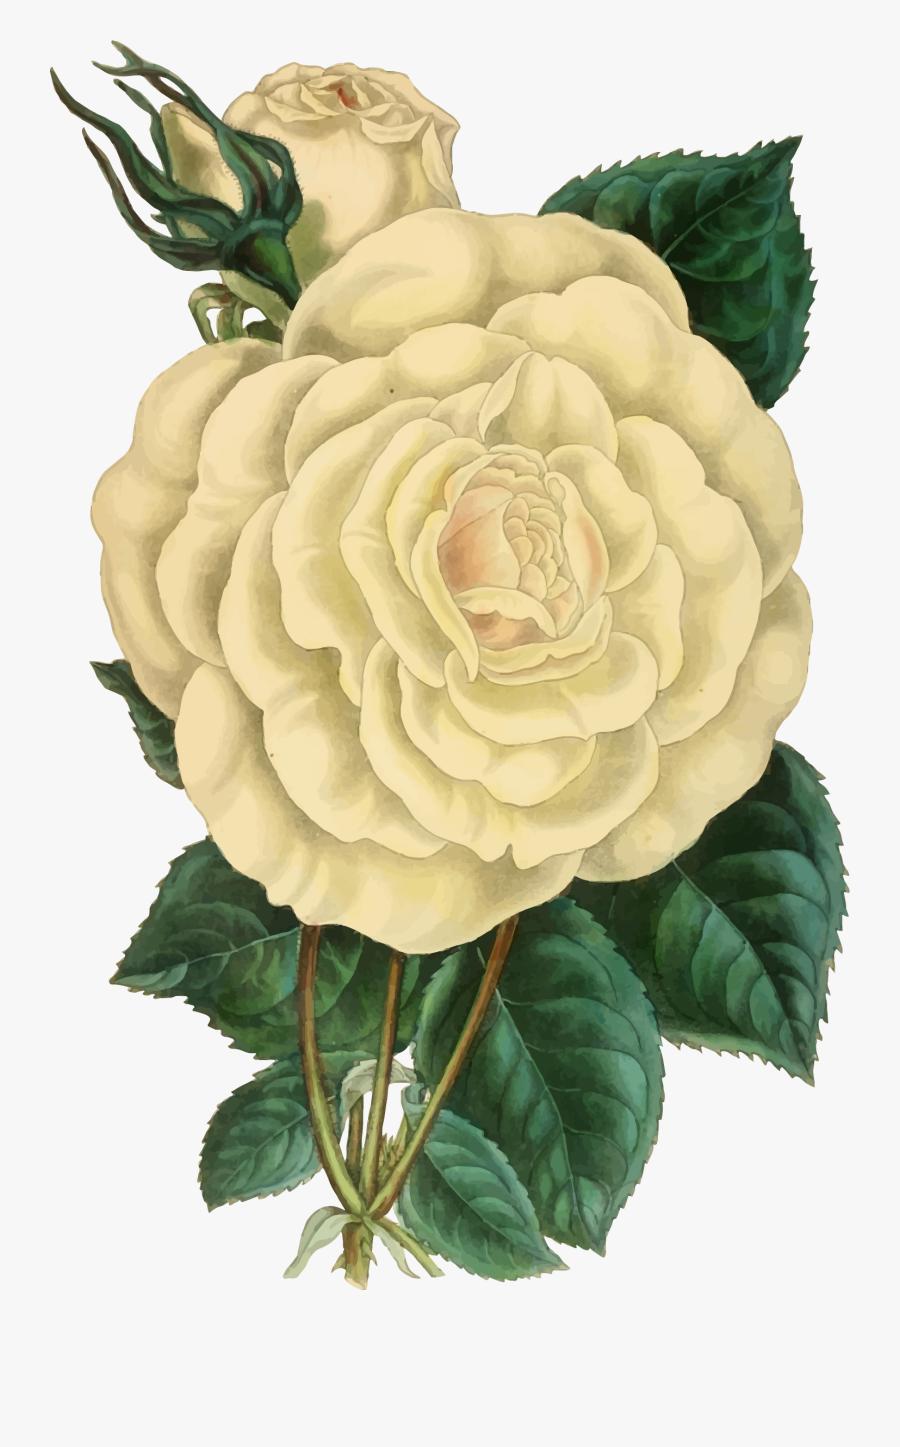 Clipart - Vintage Rose Illustration Png, Transparent Clipart